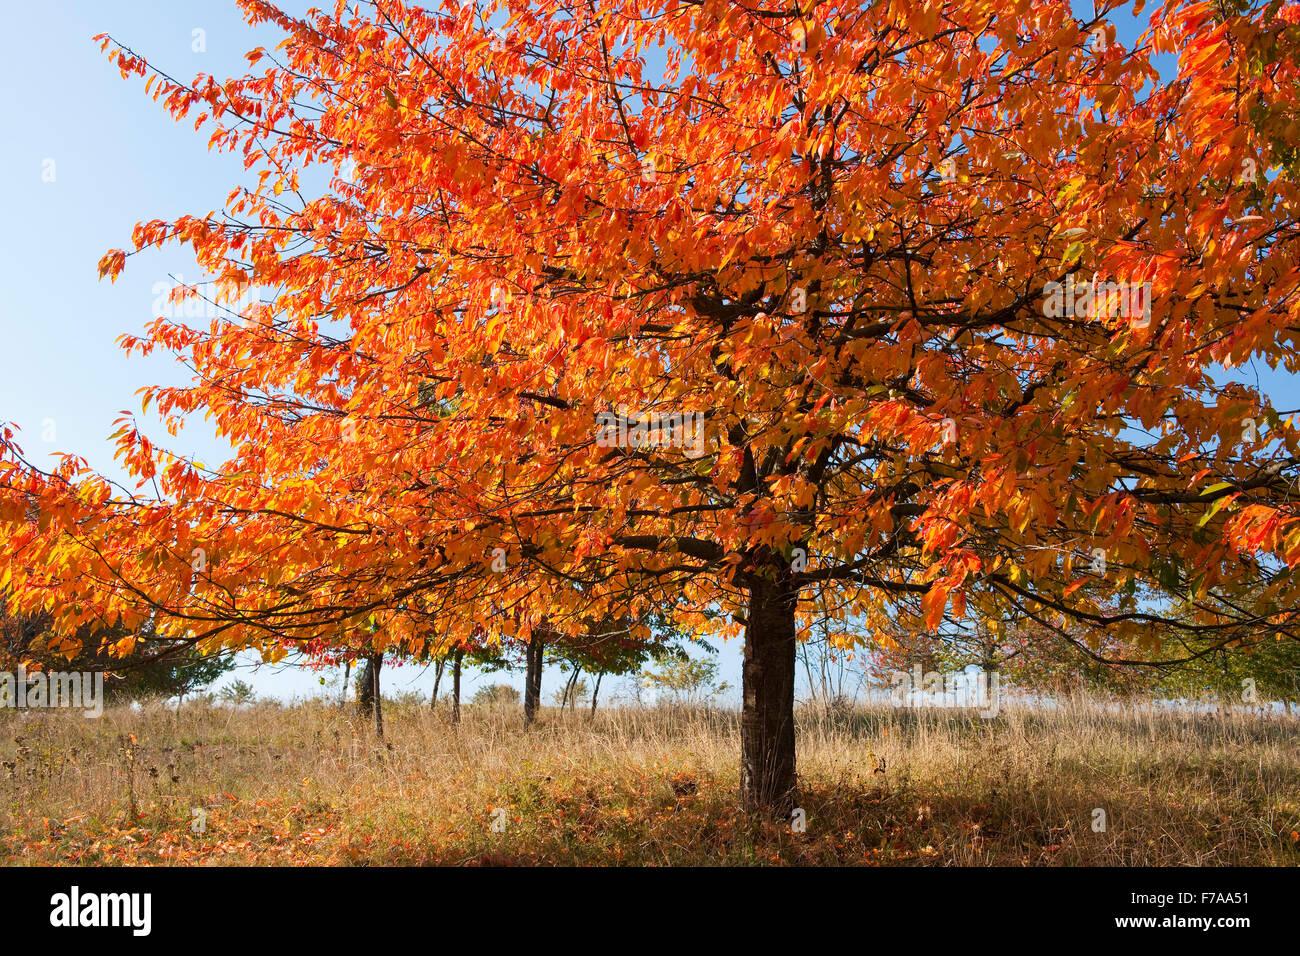 Bird cherry (Prunus avium), orchard in autumn, Thuringia, Germany - Stock Image